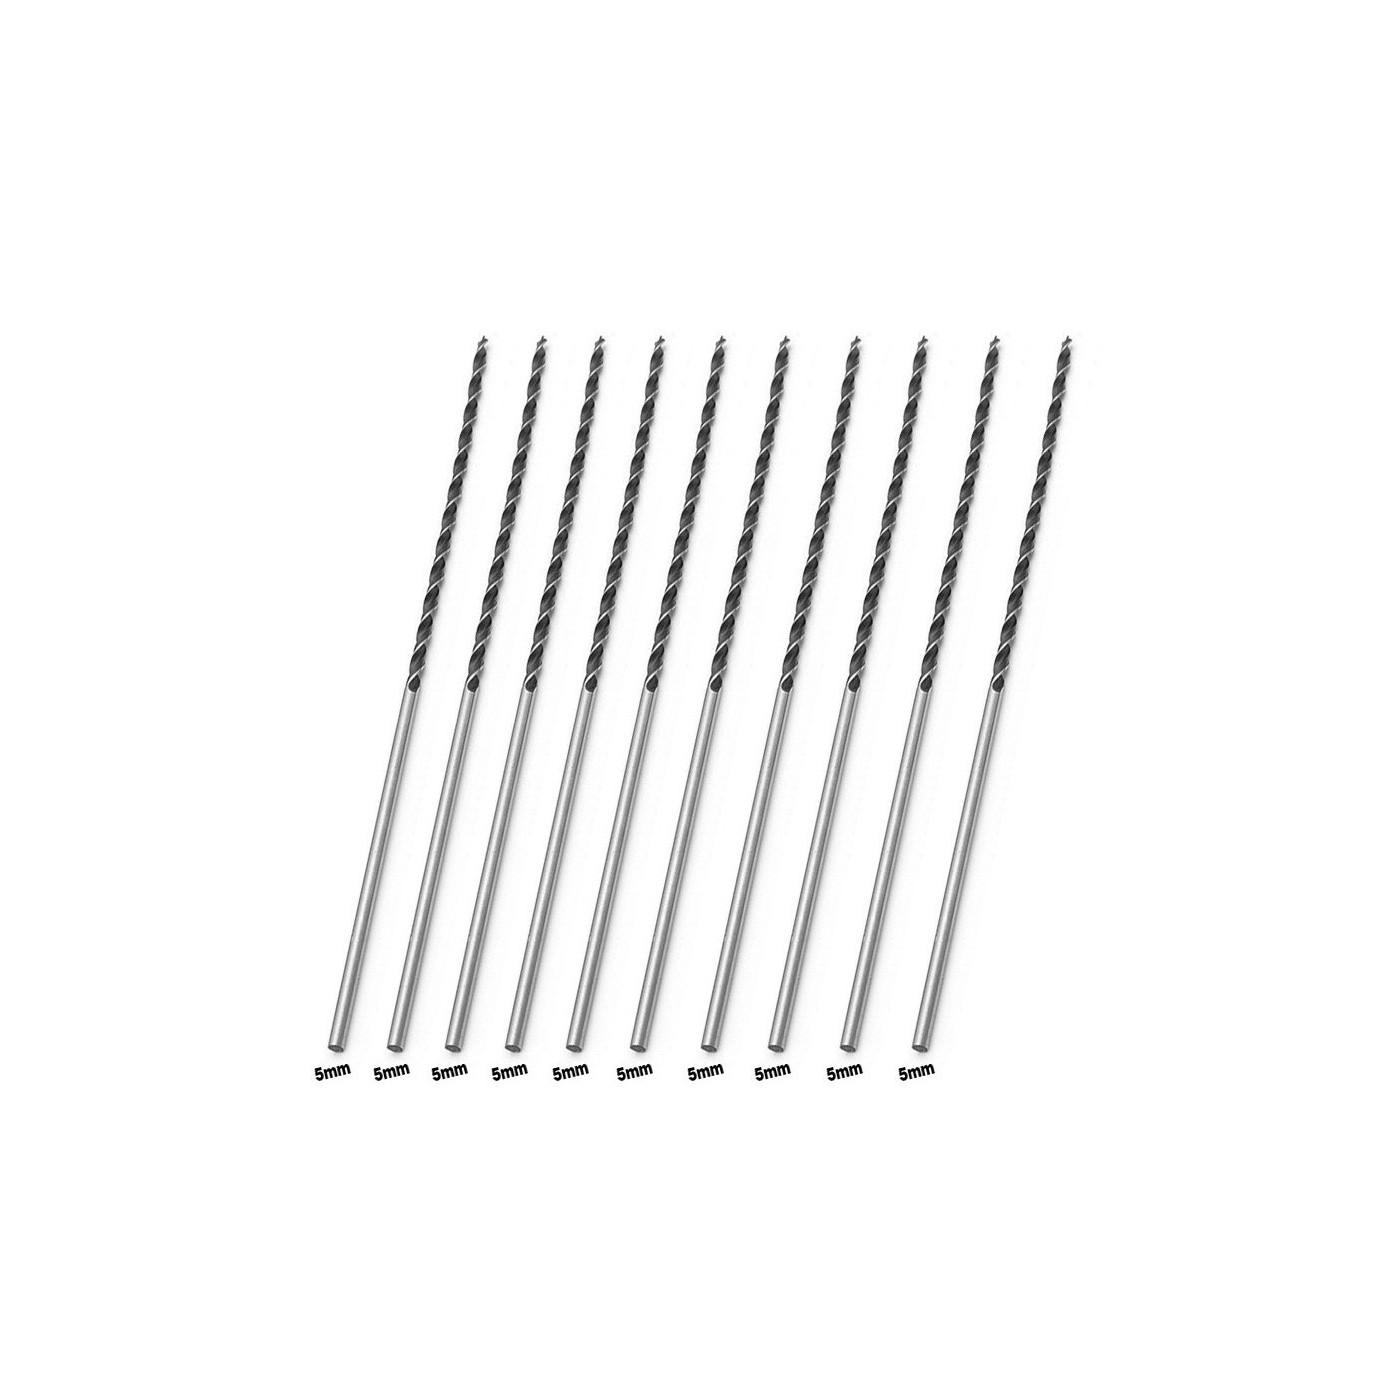 Juego de 10 brocas de madera extra largas (5x300 mm)  - 1